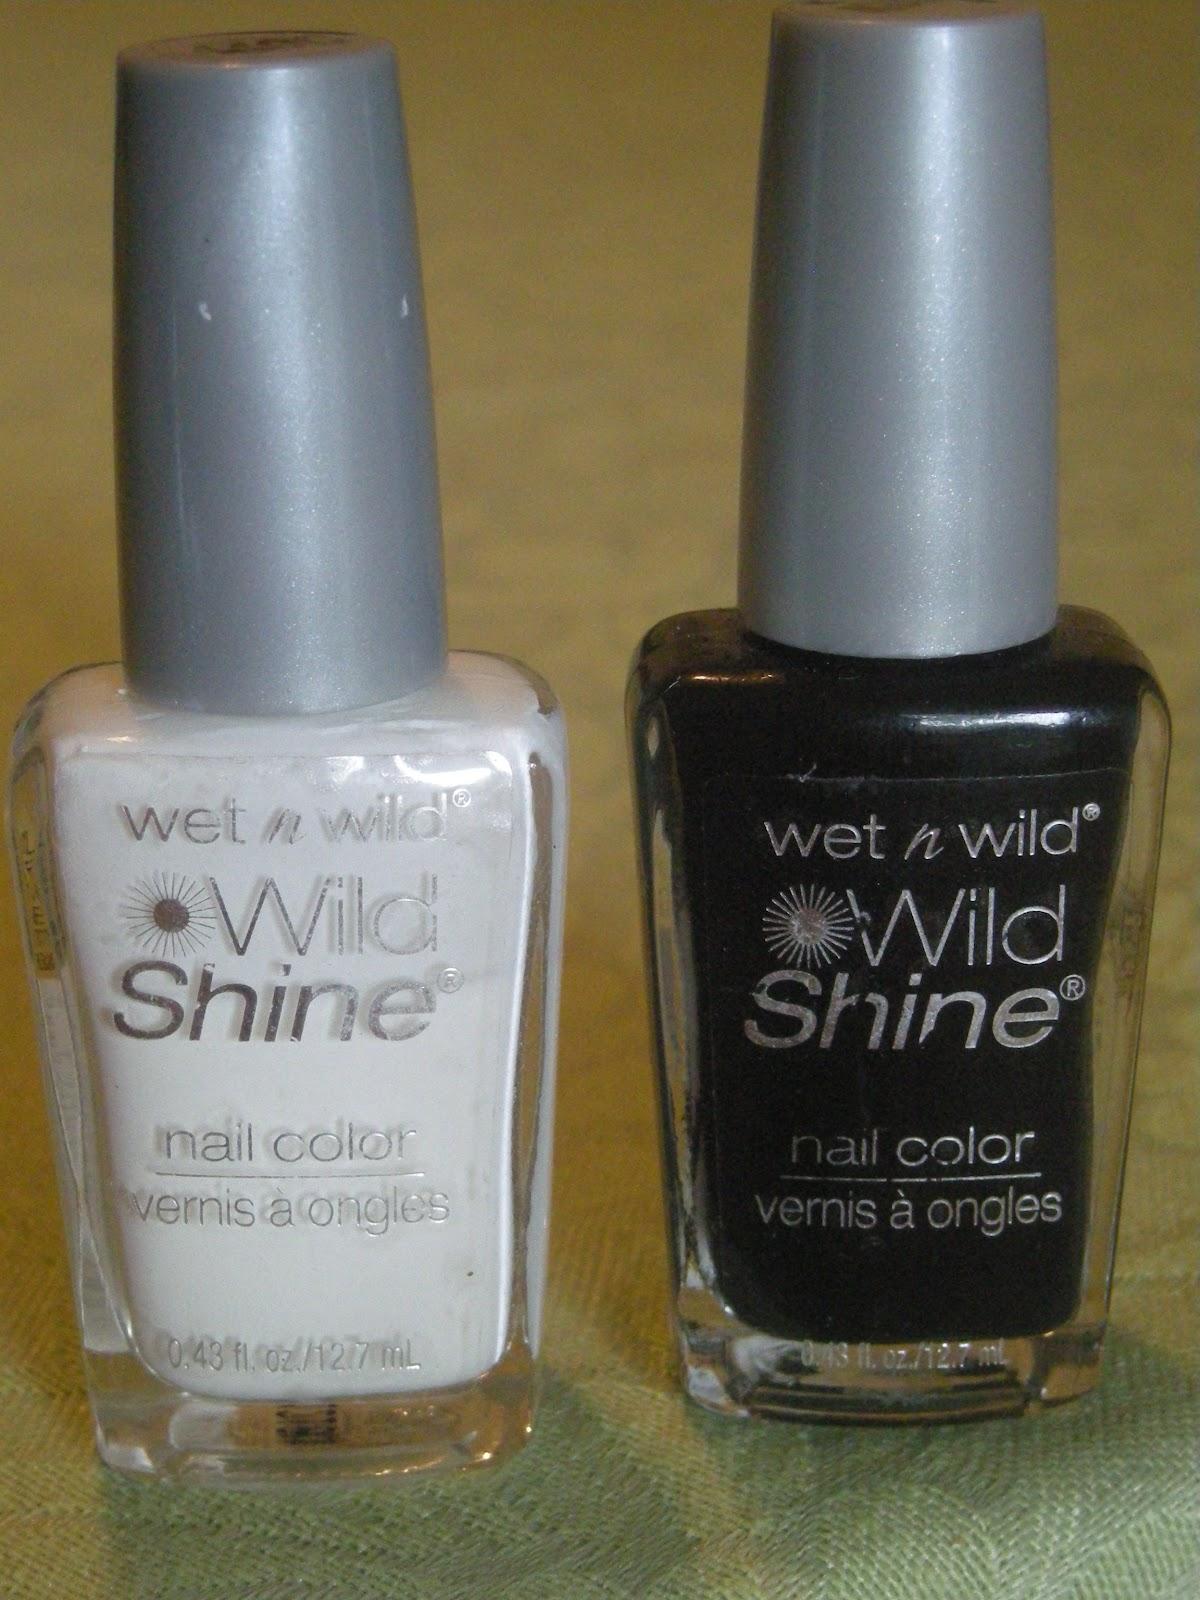 31dc2012 Day 10 Gradient Nails: Polish Cart: 31DC2012 DAY 7: Black & White